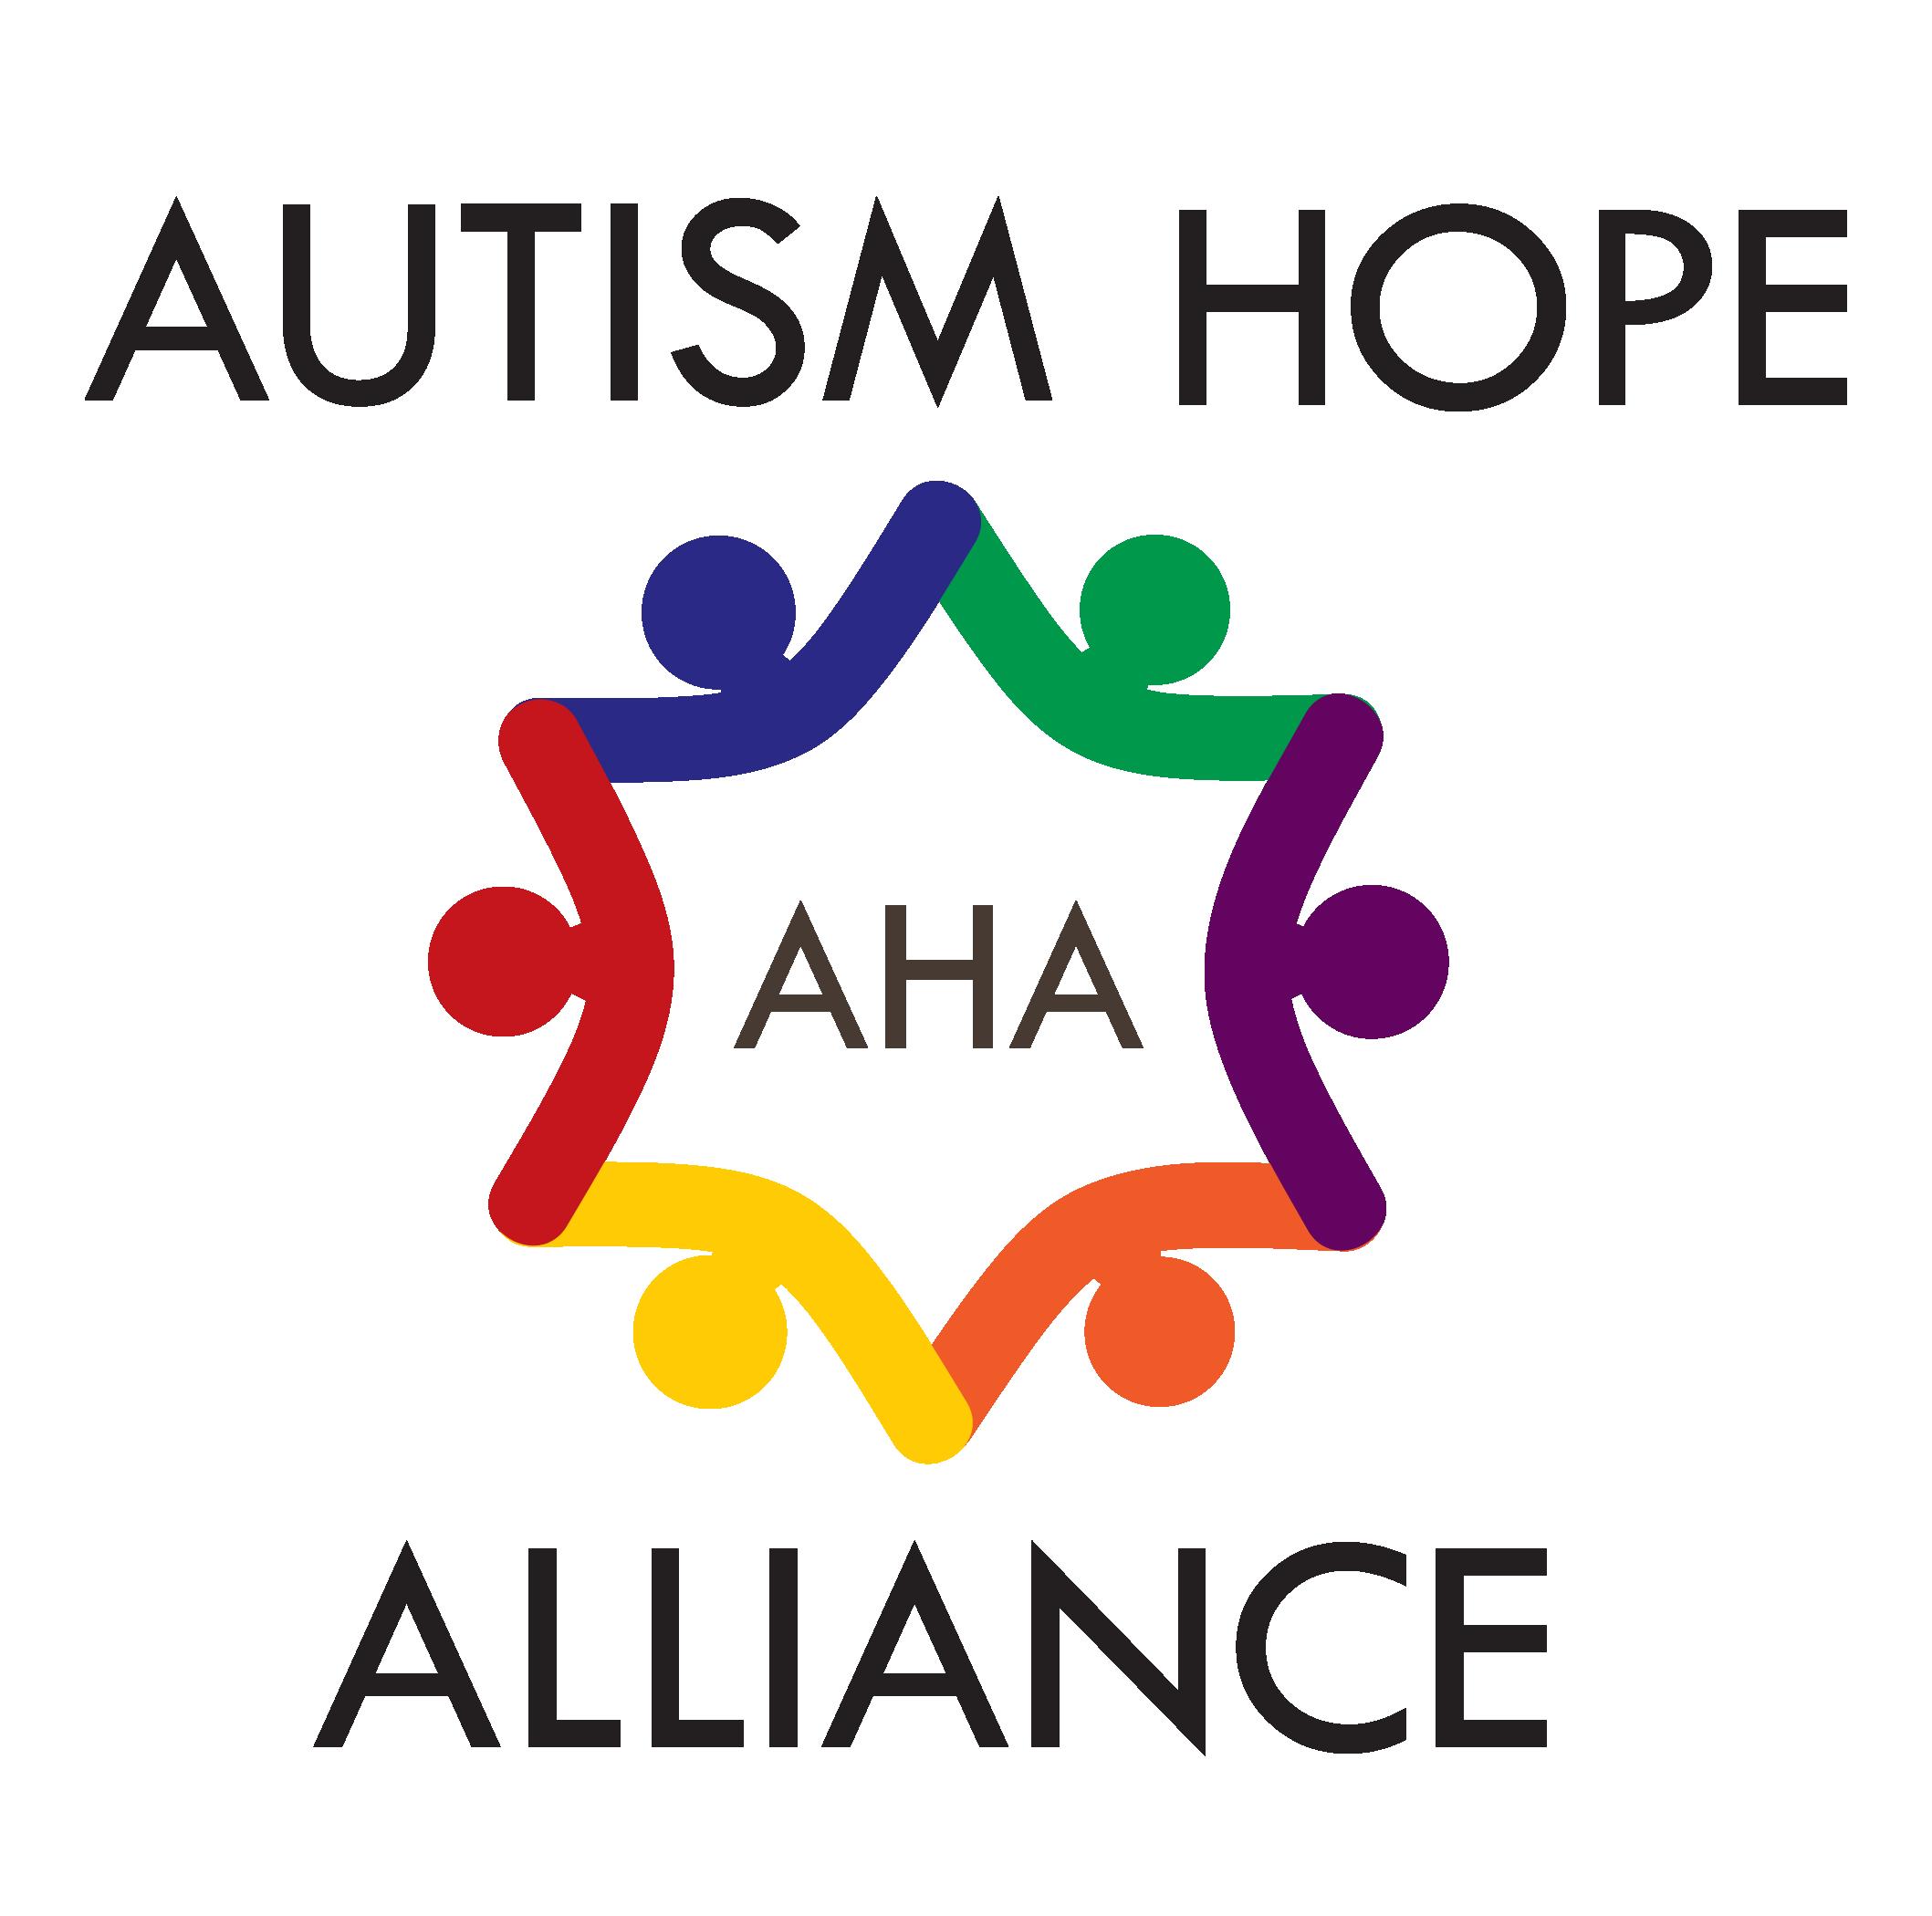 Autism_Hope_Alliance_Logo_blk.png